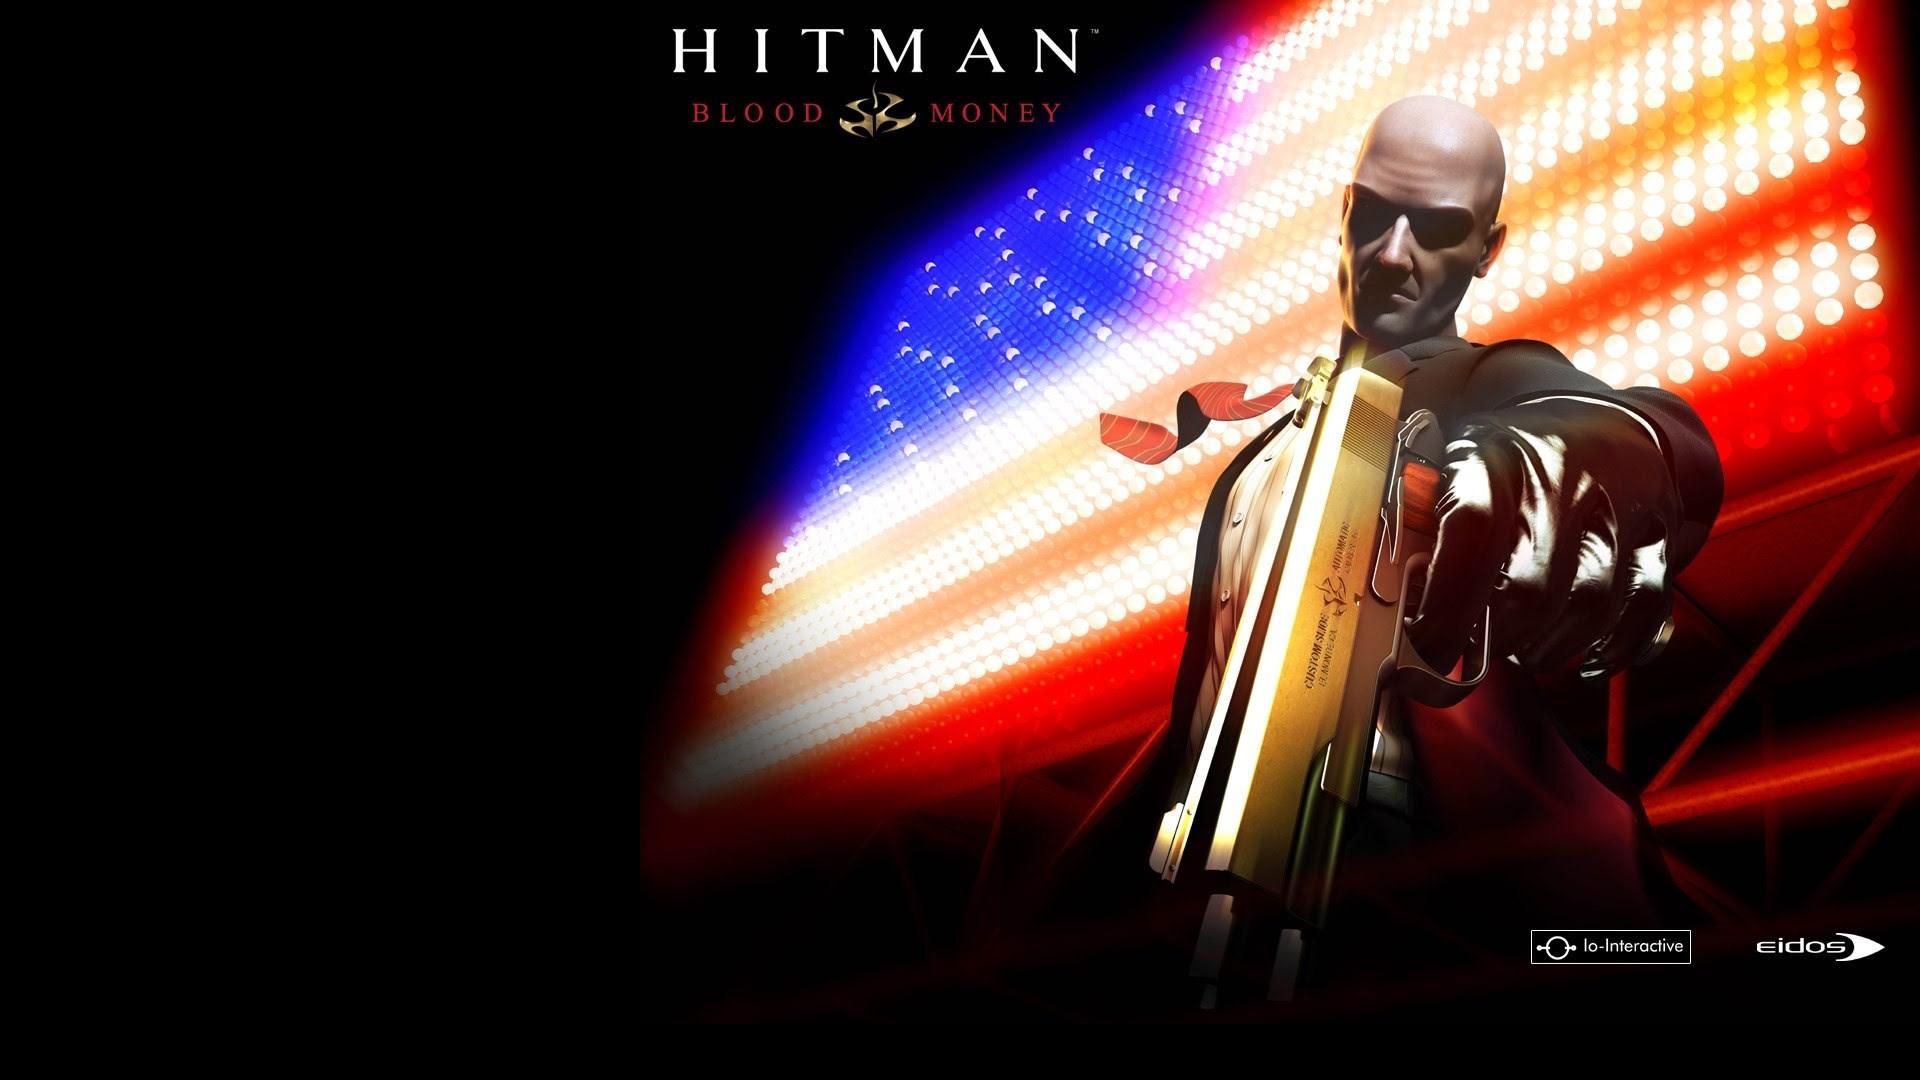 Hitman Blood Money Wallpaper (77+ images)